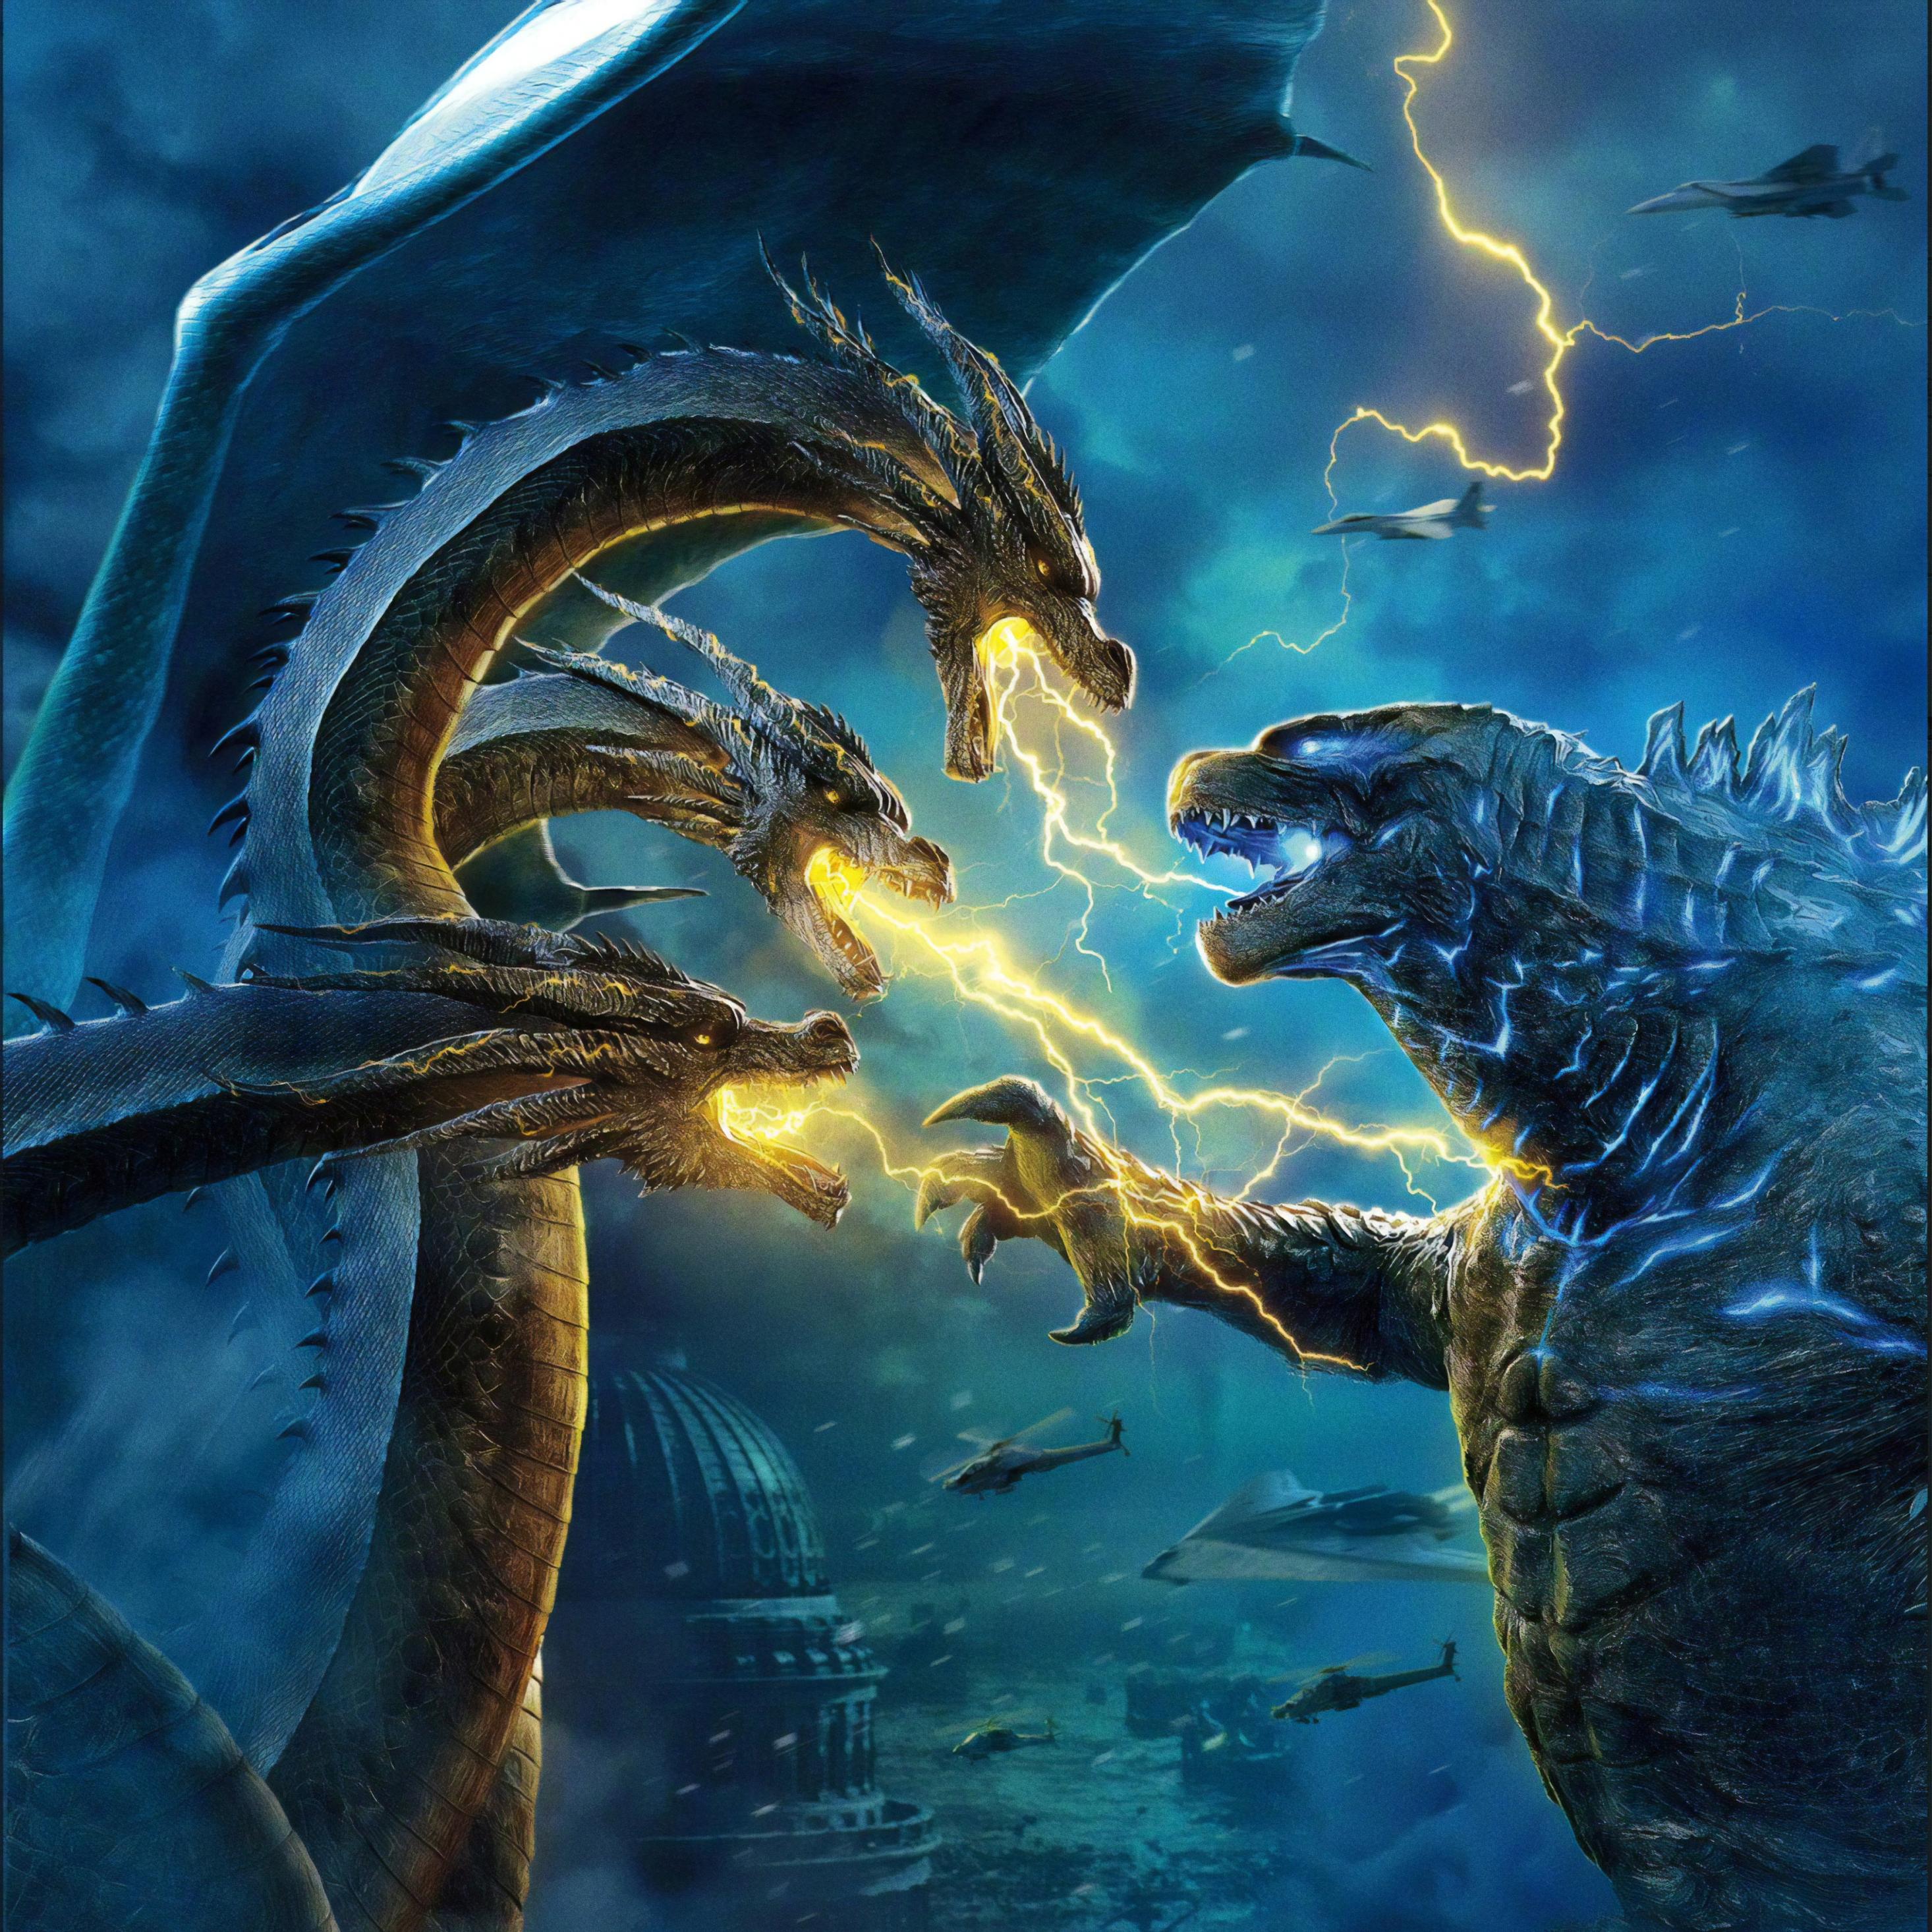 2932x2932 Godzilla King of the Monsters Movie Ipad Pro ...